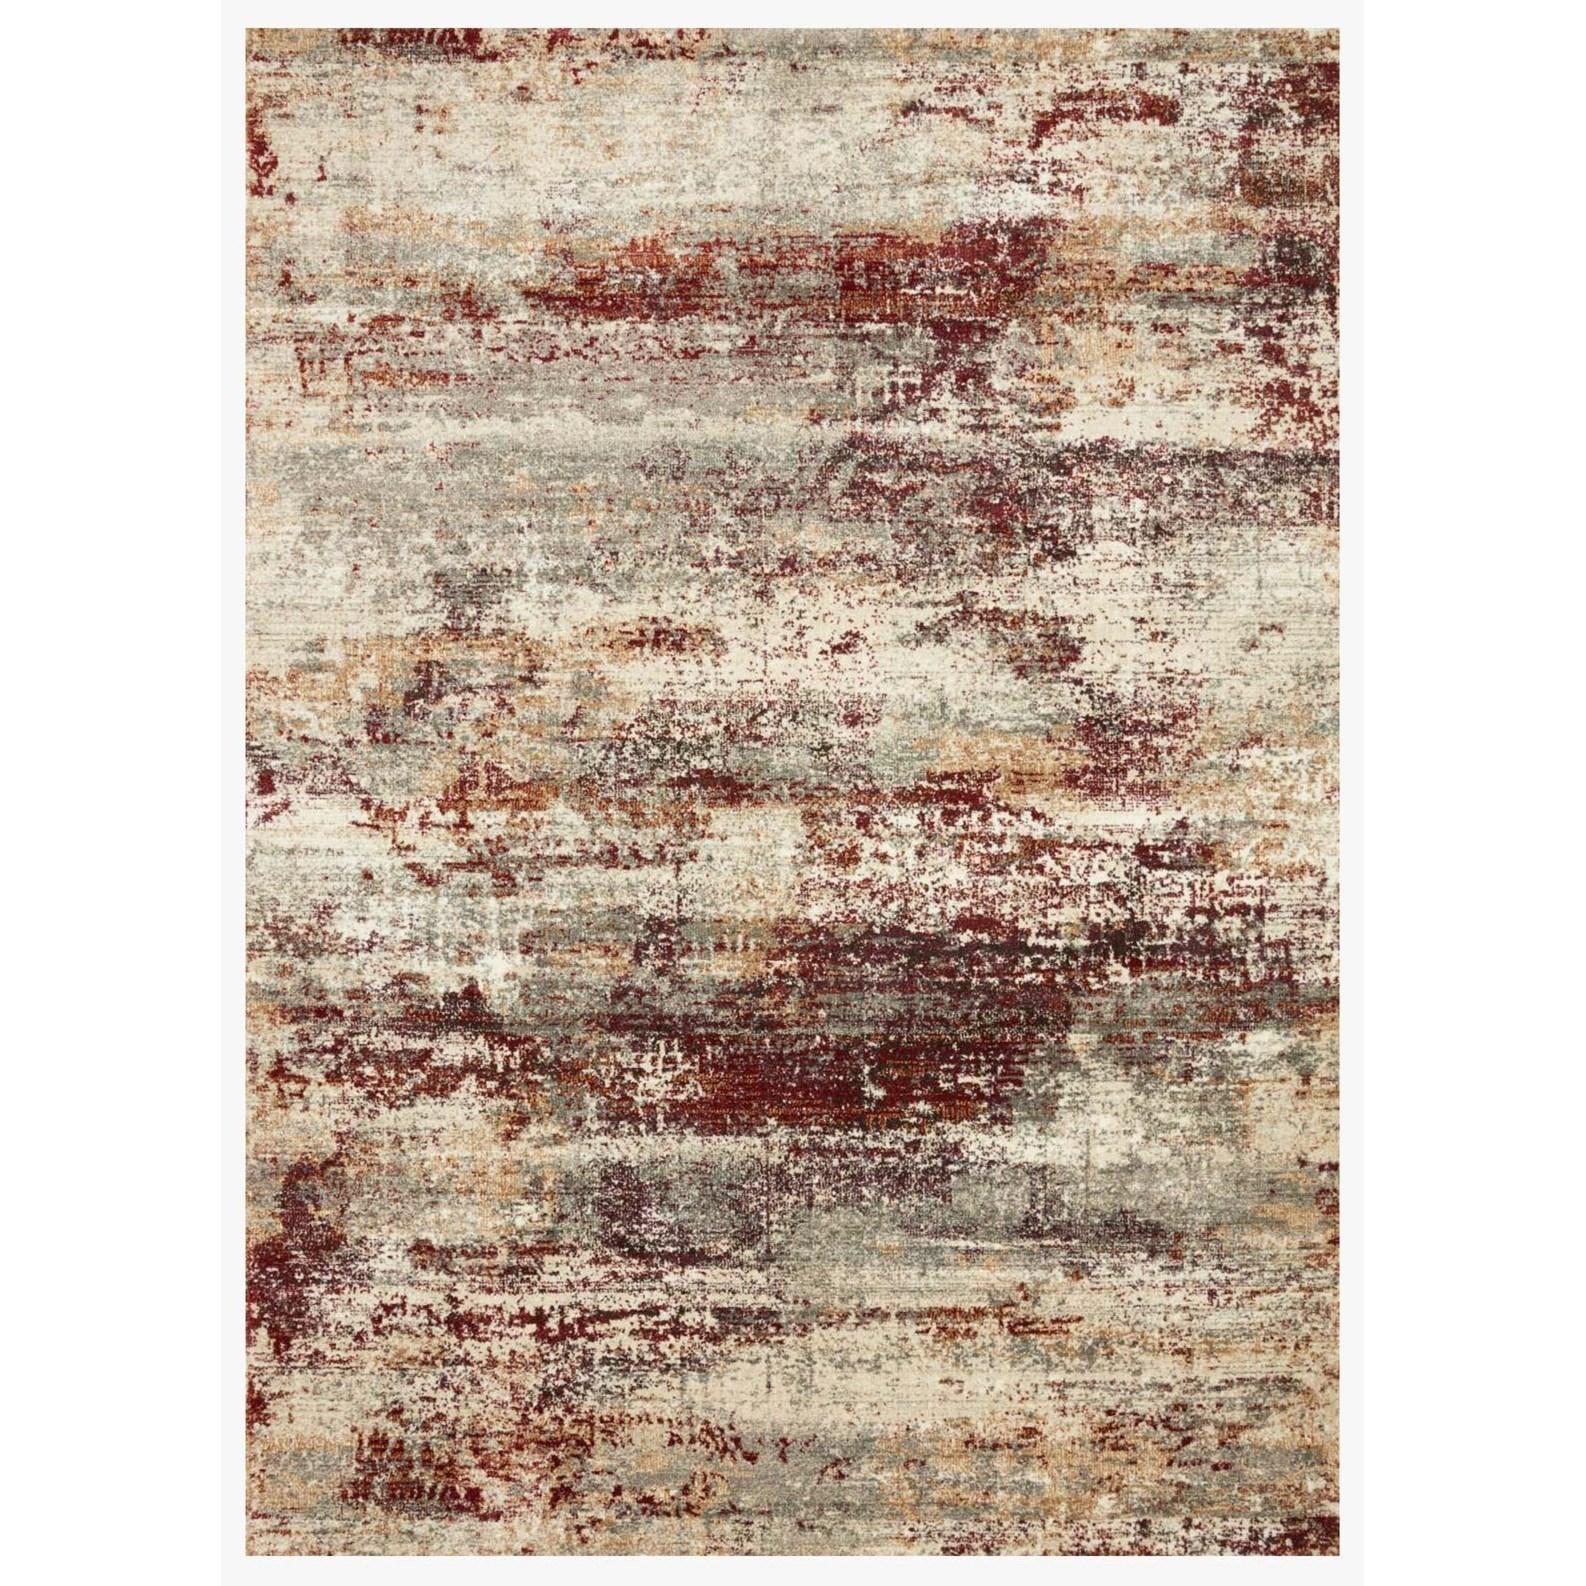 "Jasmine 7'10"" x 10'10"" Dove / Rust Rug by Loloi Rugs at Virginia Furniture Market"